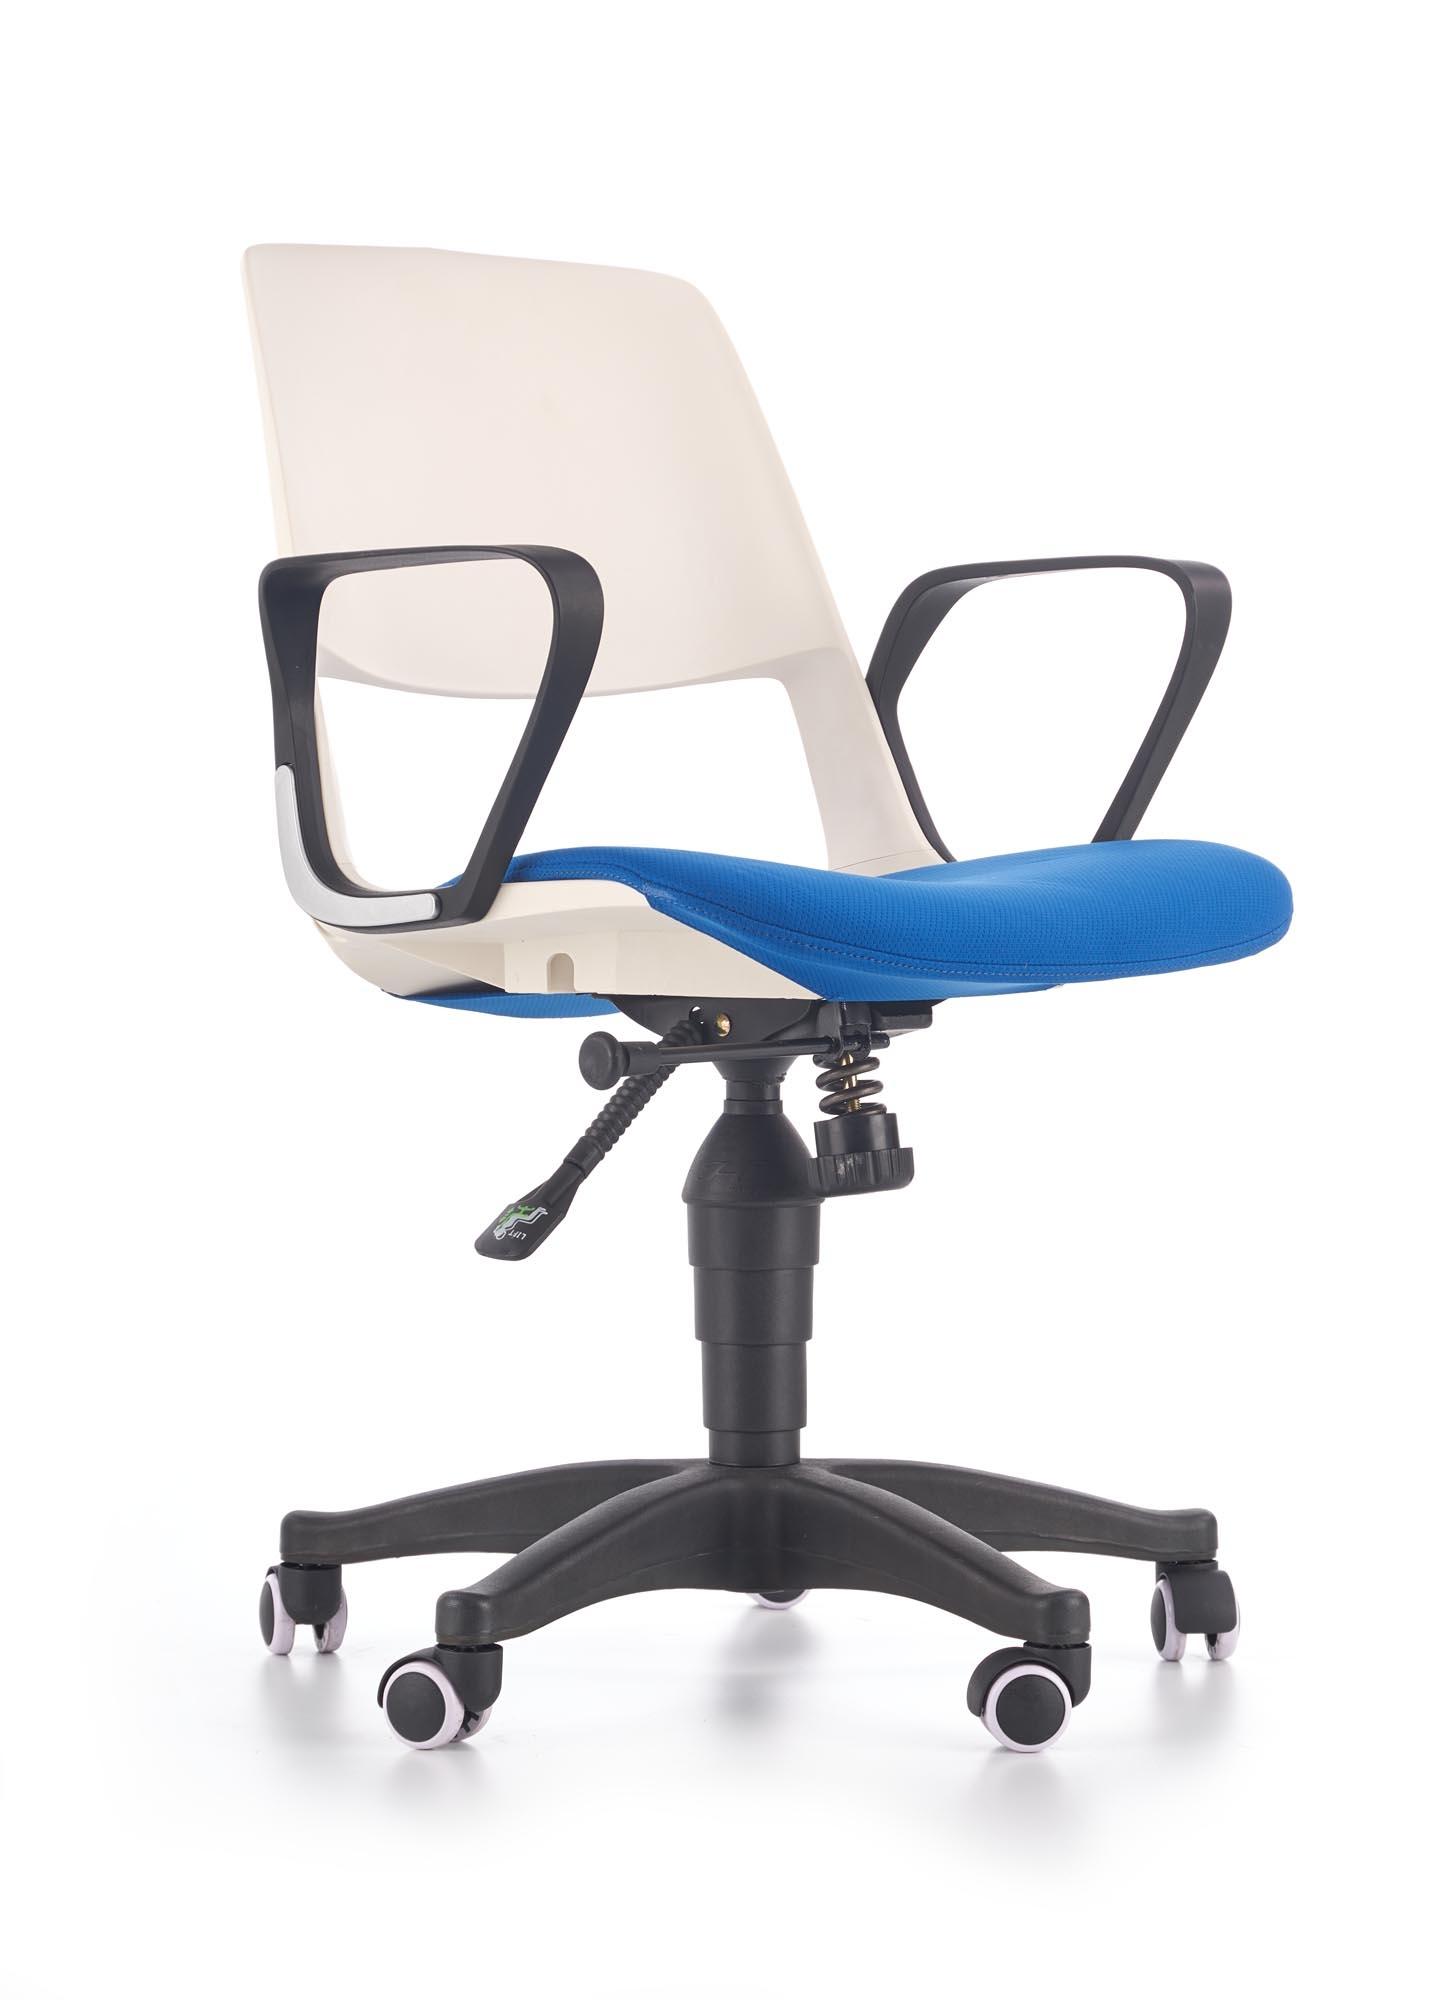 Scaun de birou pentru copii, tapitat cu stofa Janise Alb / Albastru, l60xA50xH84-93 cm imagine